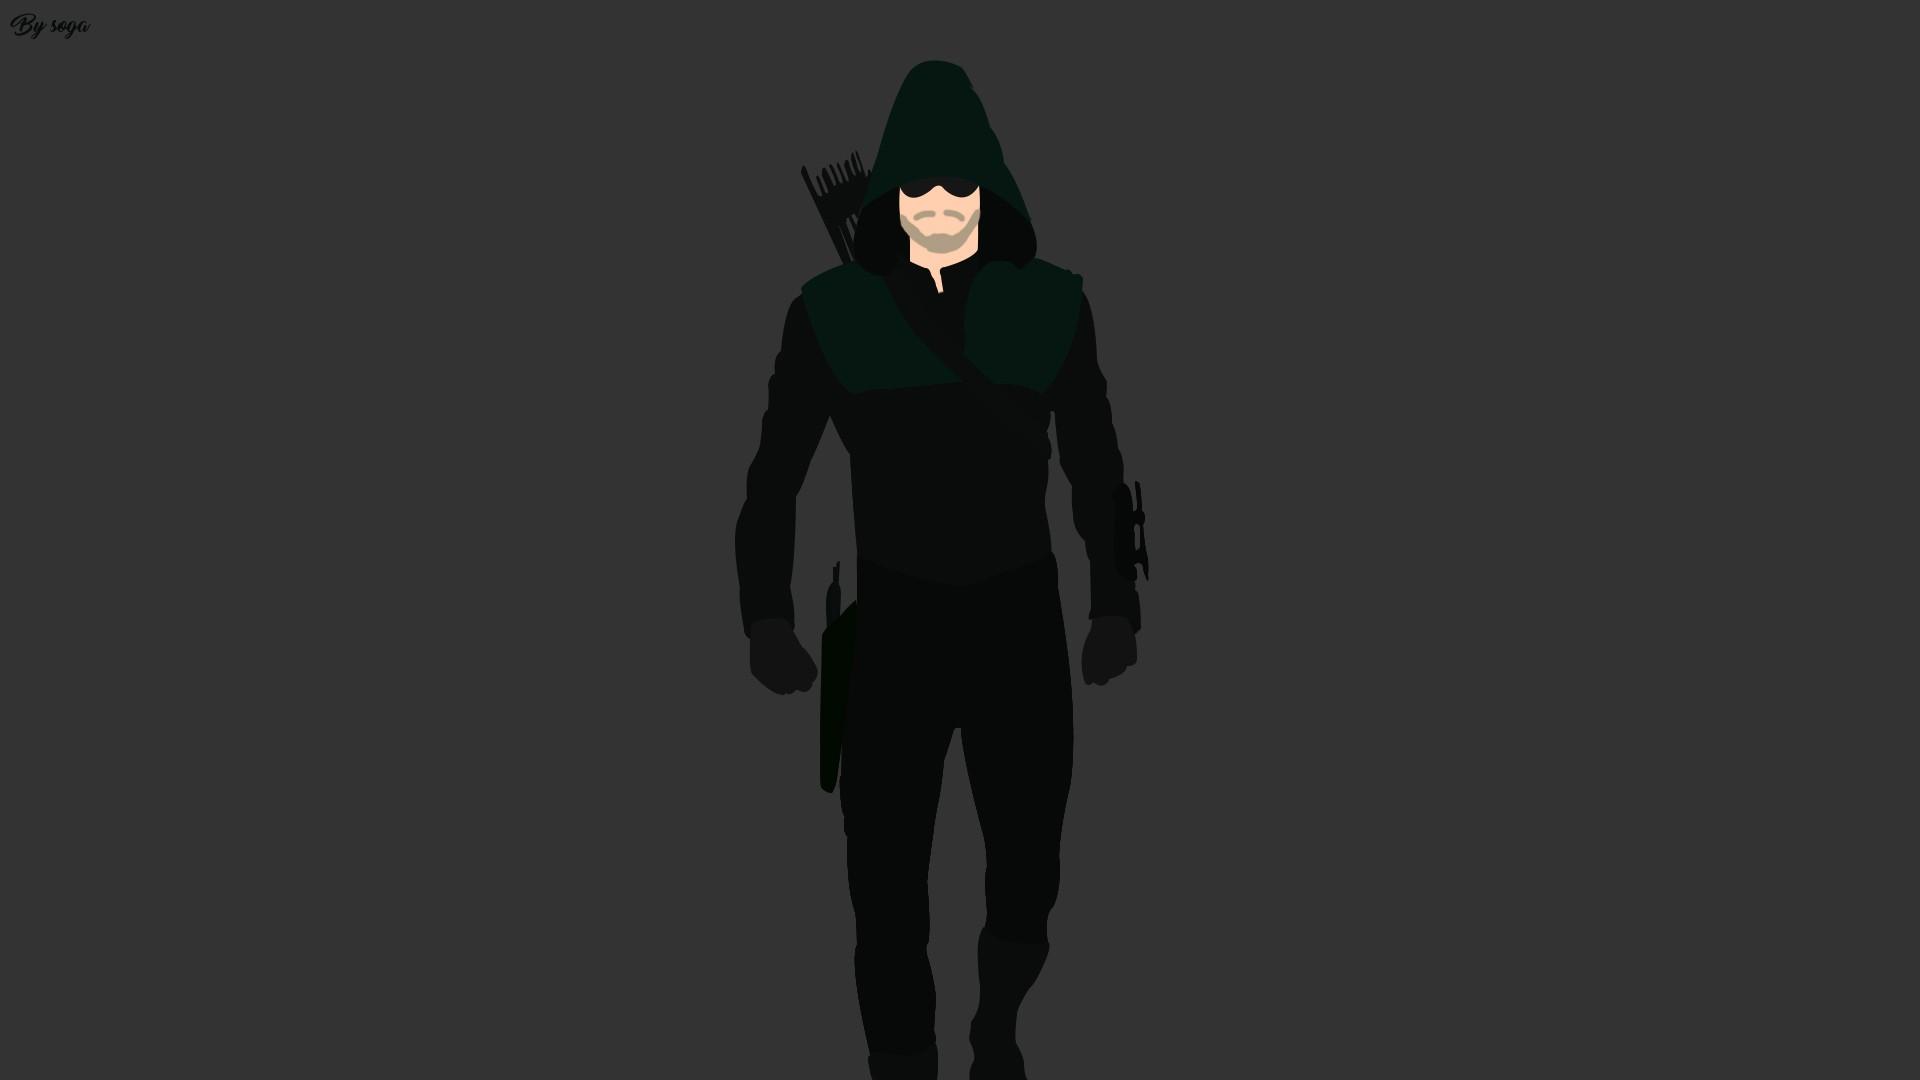 General 1920x1080 Green Arrow DC Universe Arrow (TV series) vector